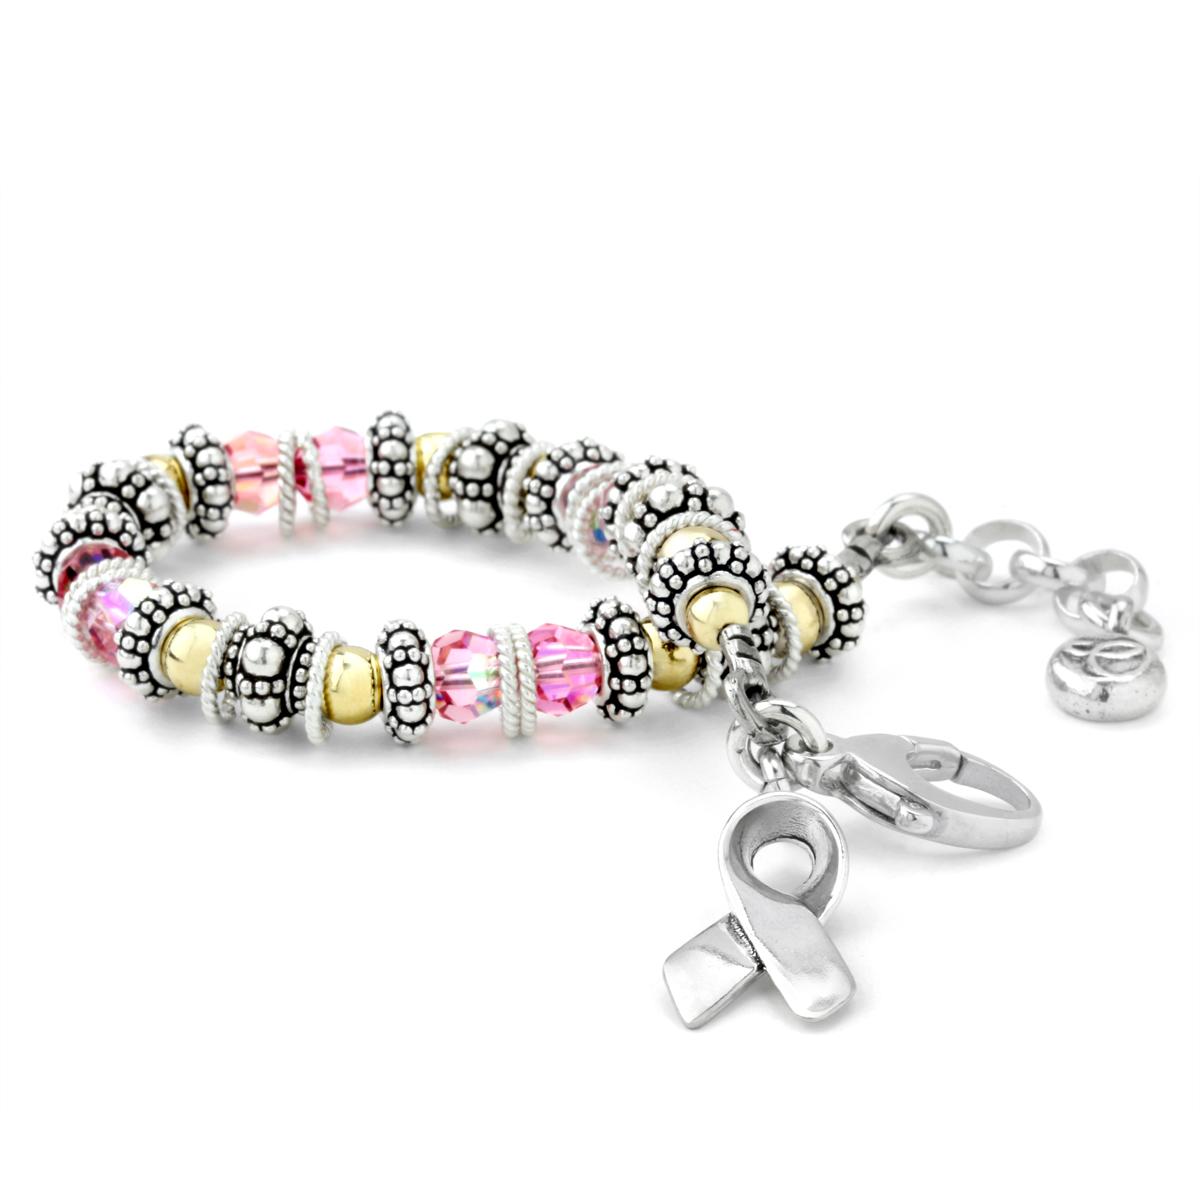 afa9e2fd5 Elisa Ilana Breast Cancer Awareness Bracelet